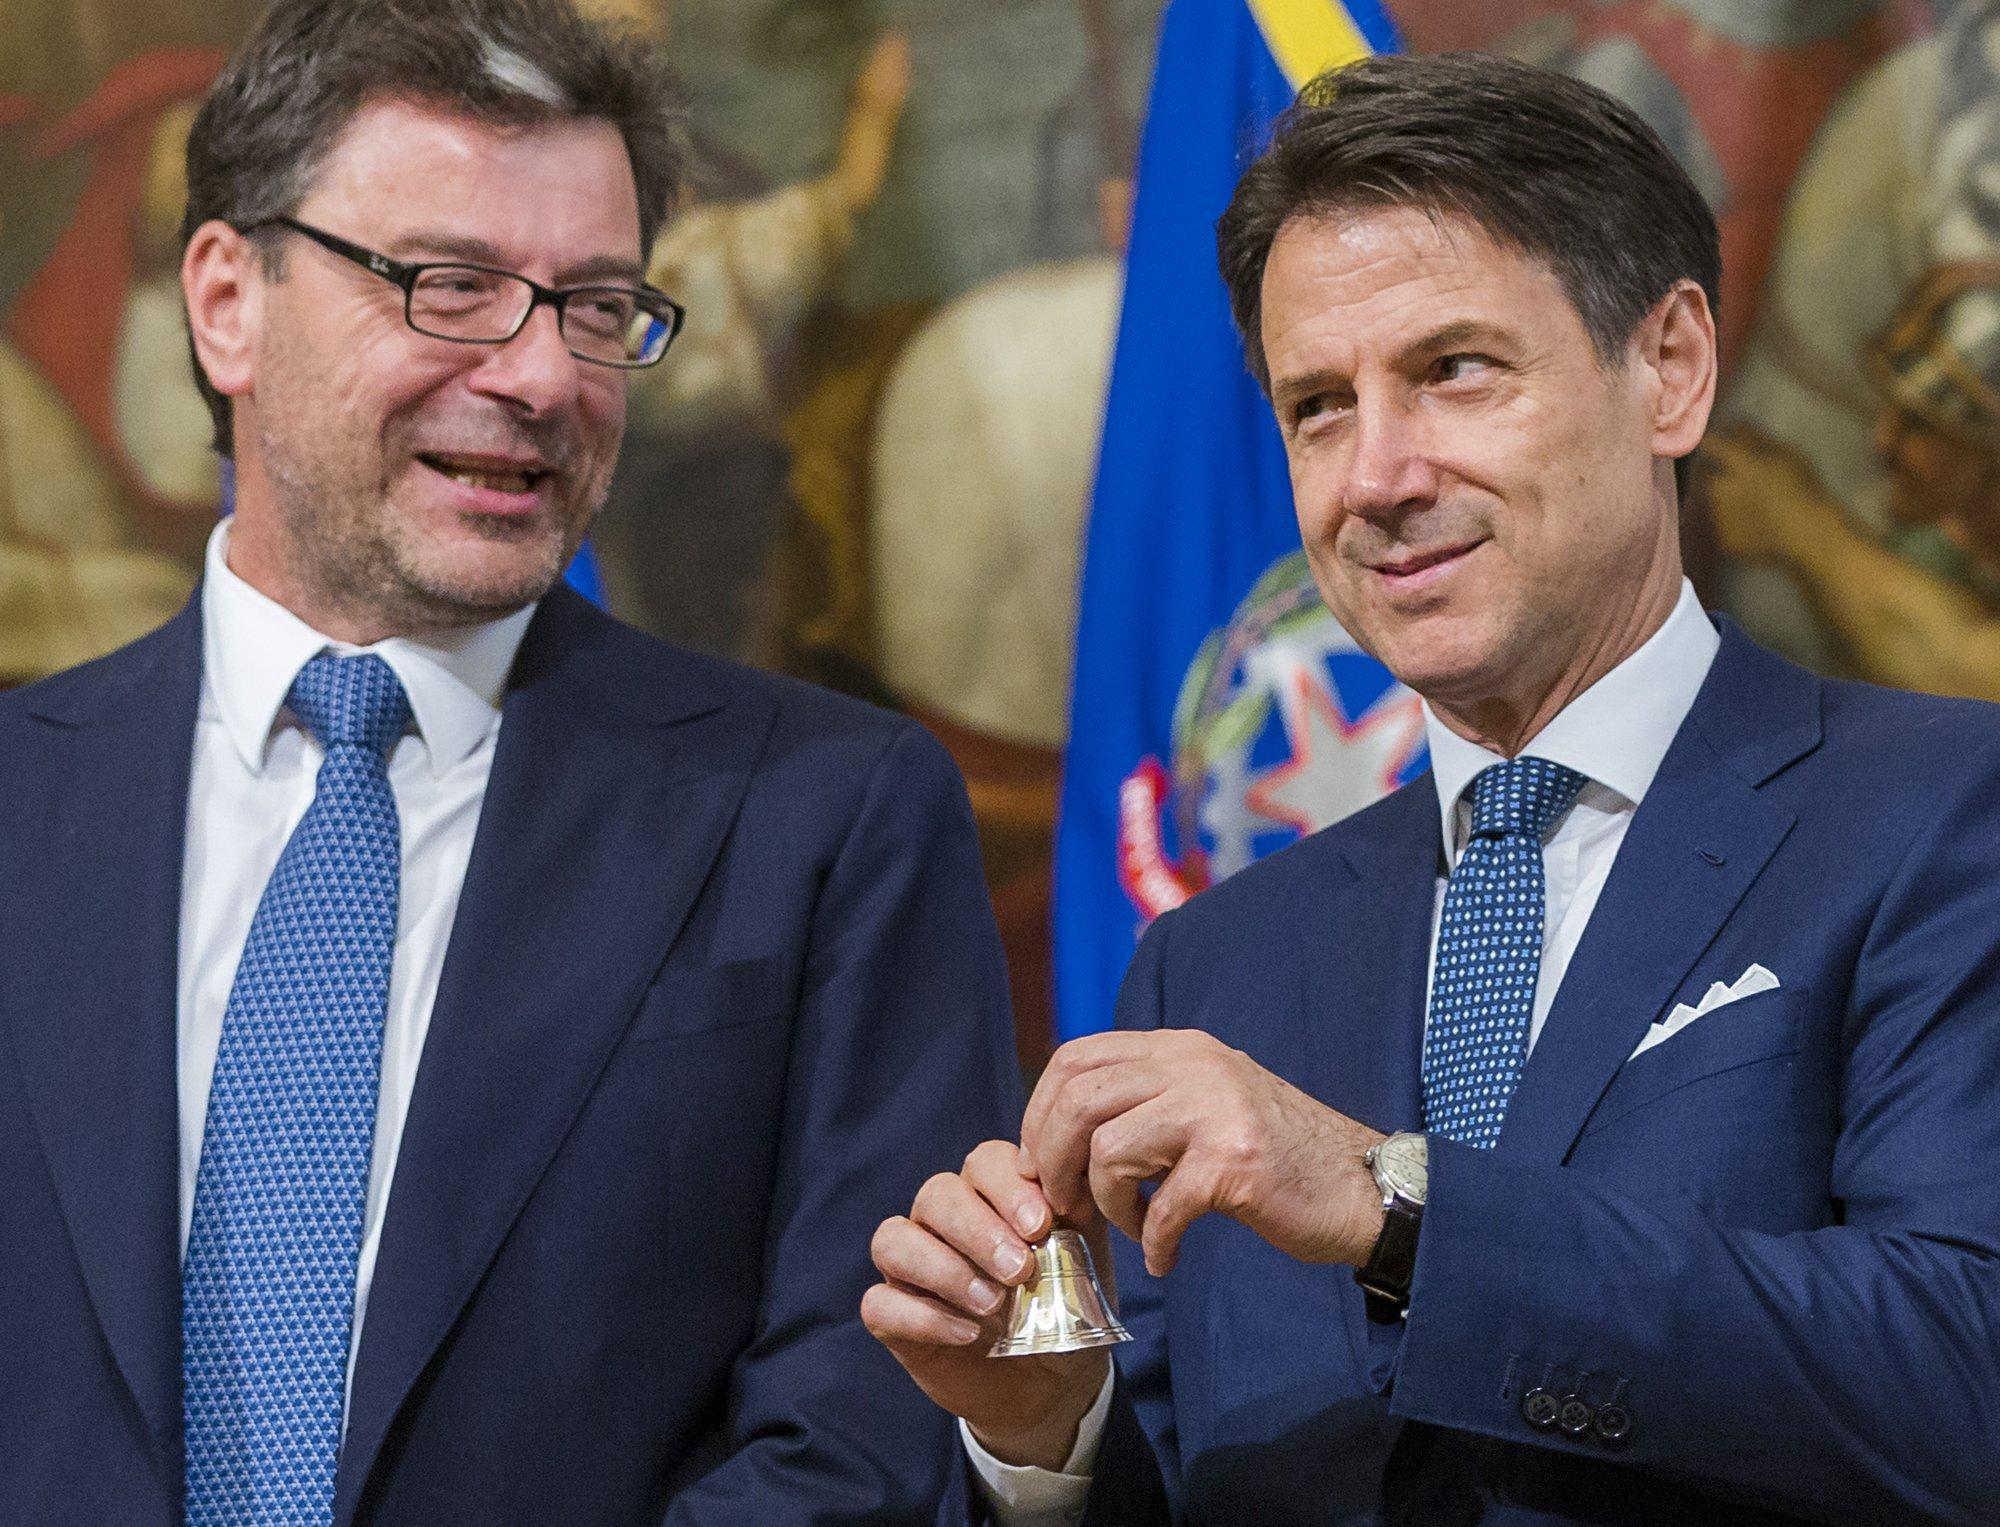 Italy-EU honeymoon has just started, but needs to last